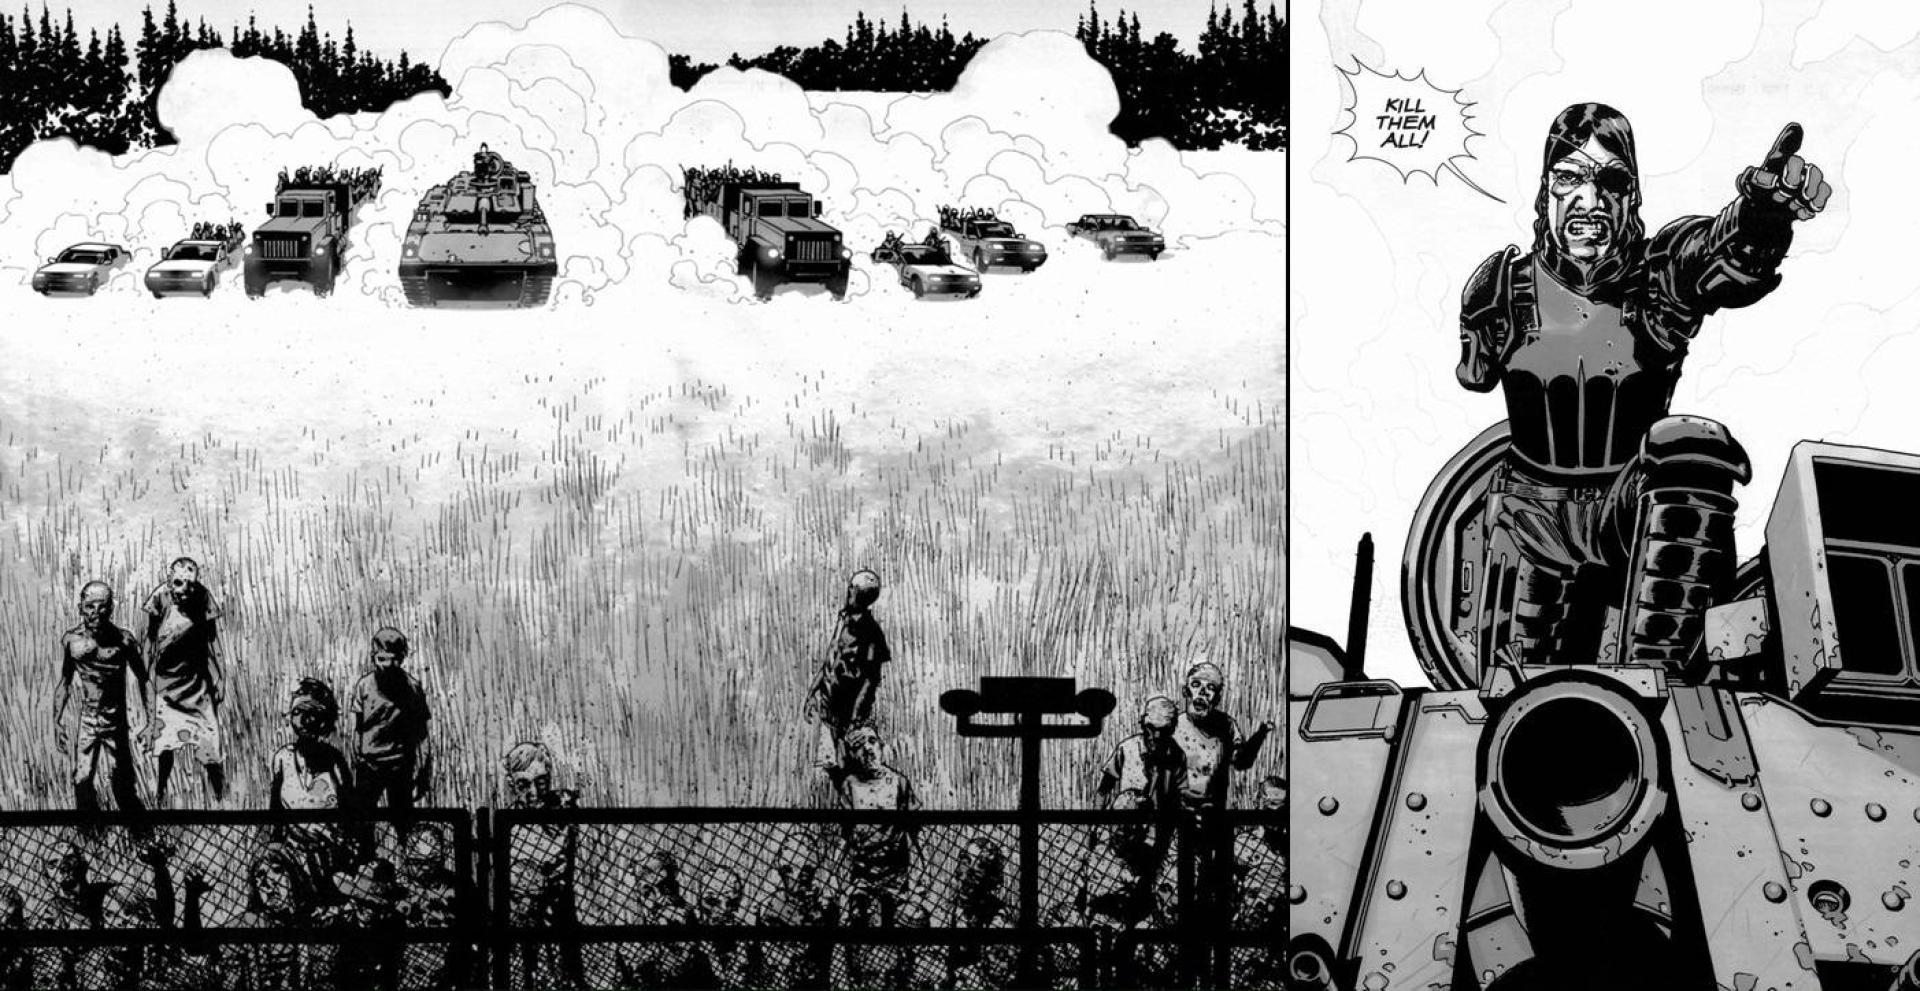 The Walking Dead 7. kötet 8. kép